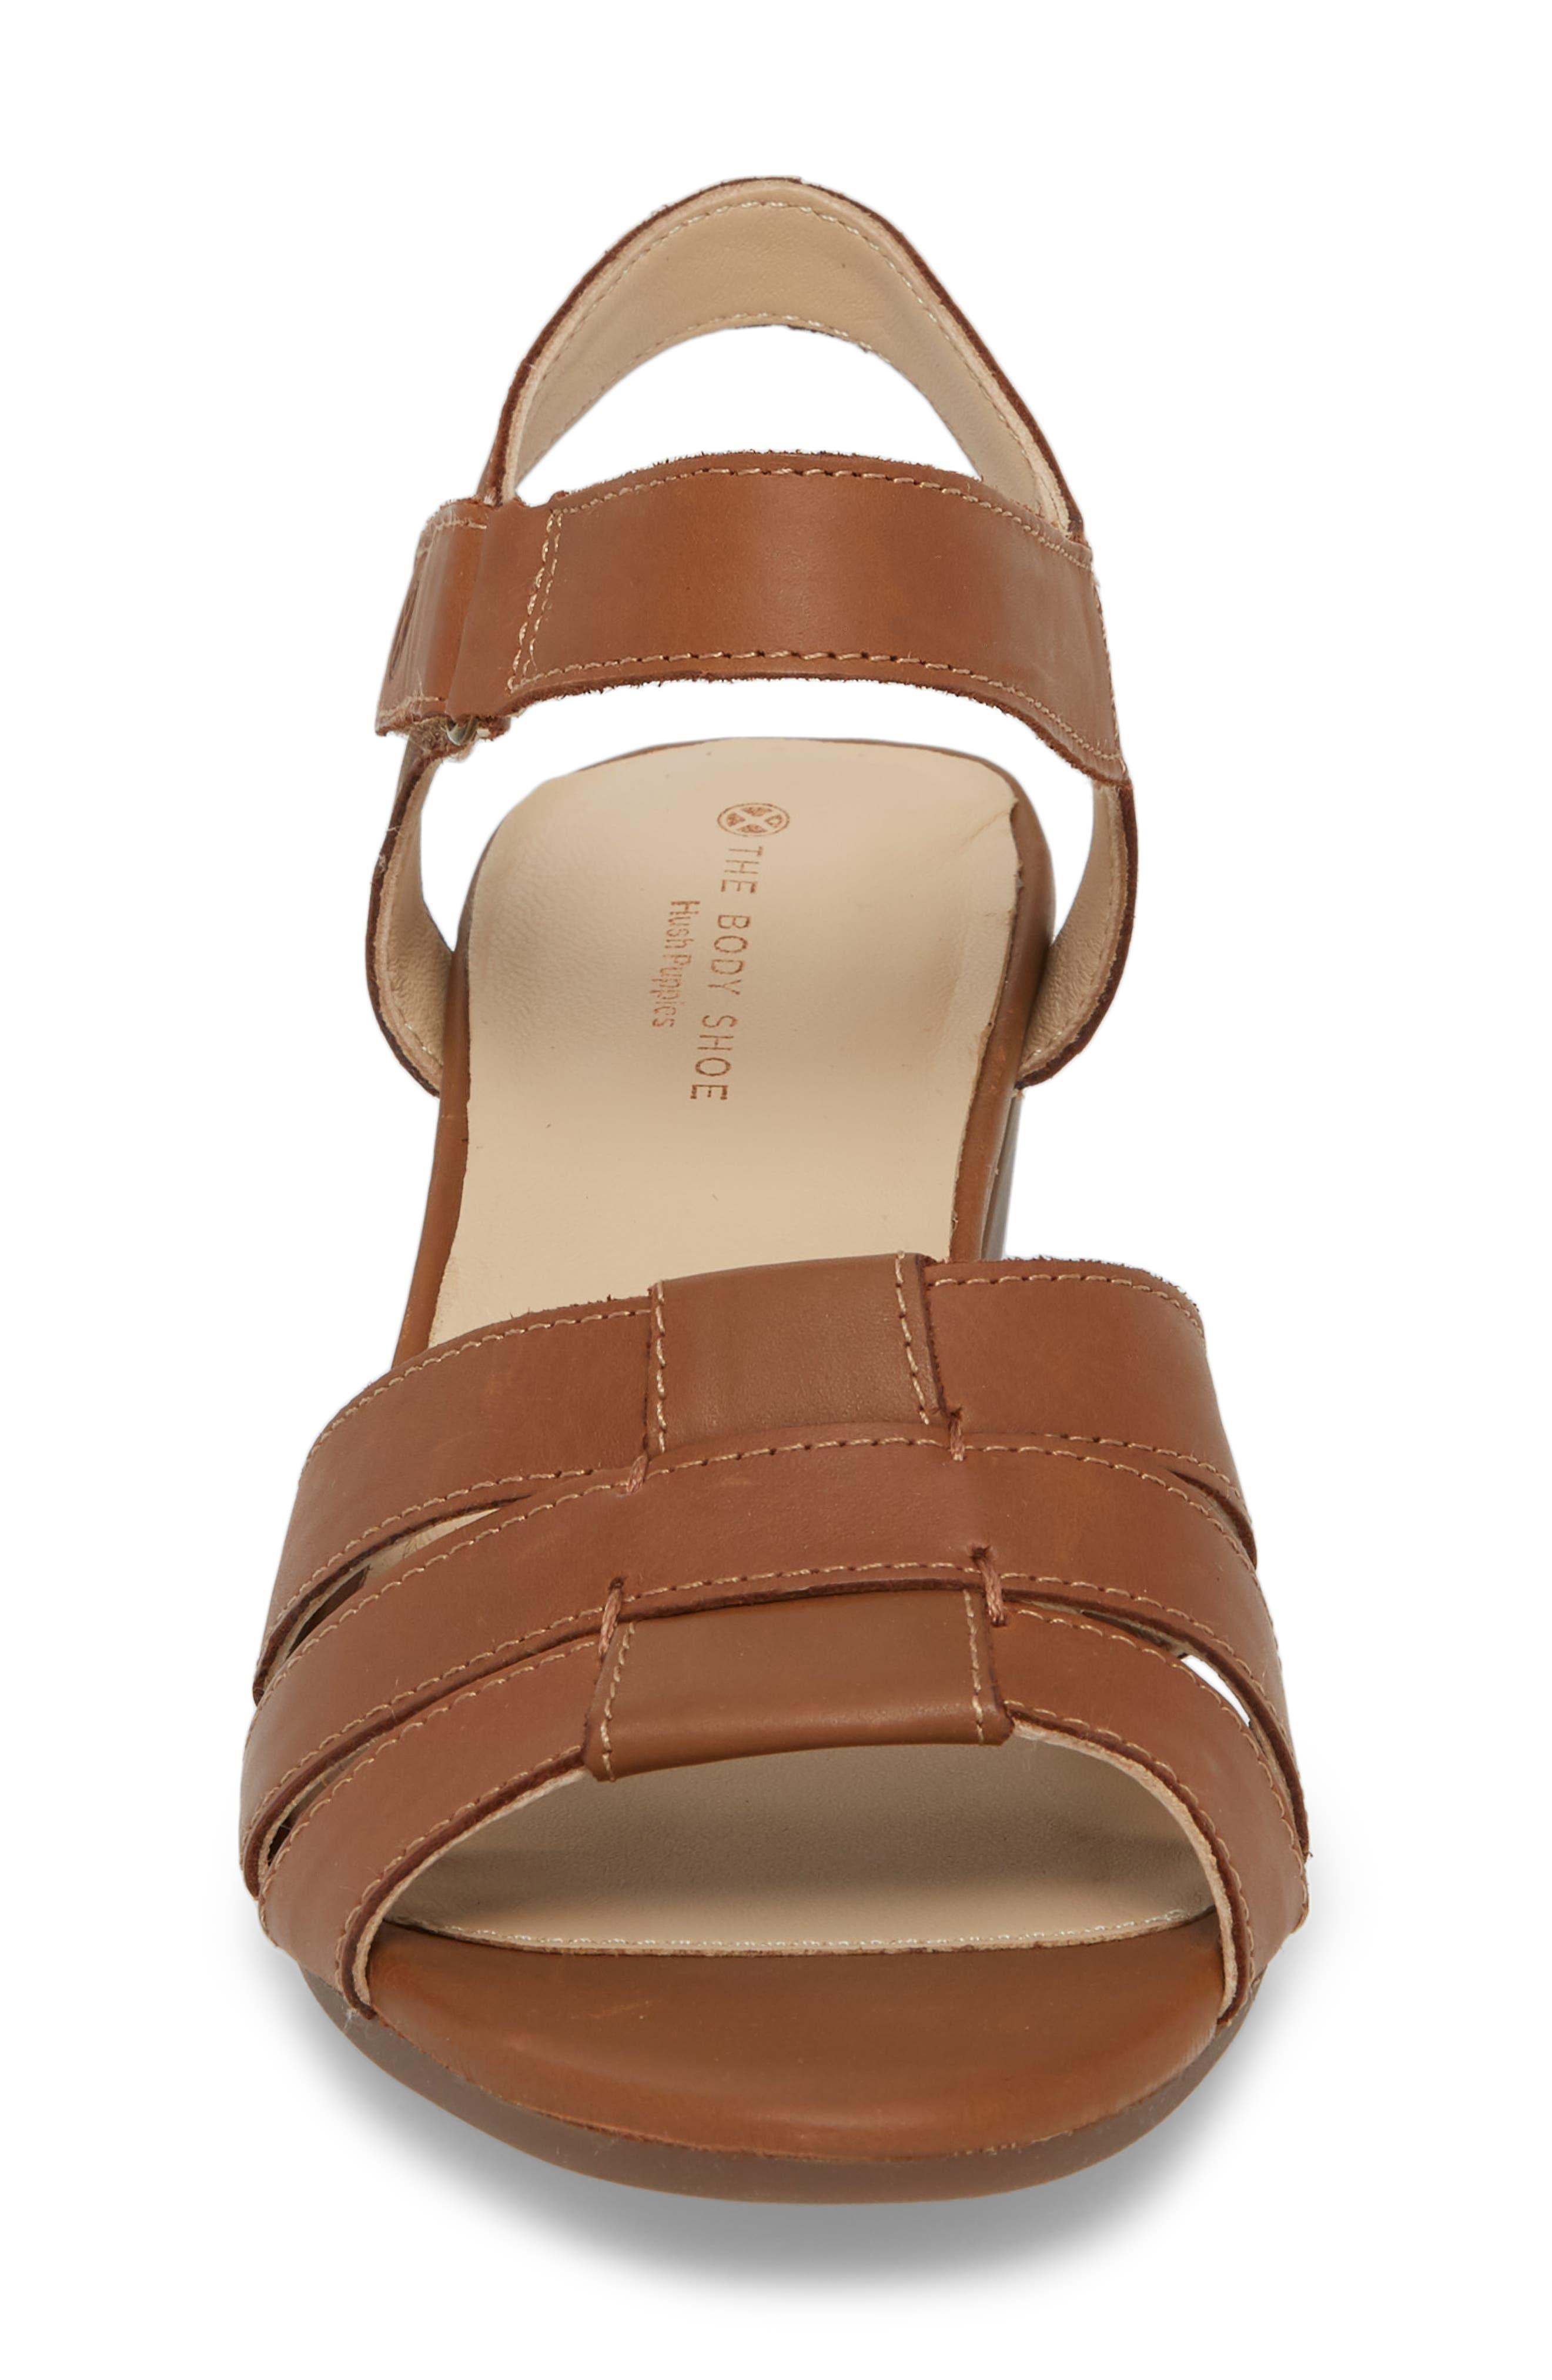 Masseter Quarter Strap Sandal,                             Alternate thumbnail 4, color,                             Tan Leather